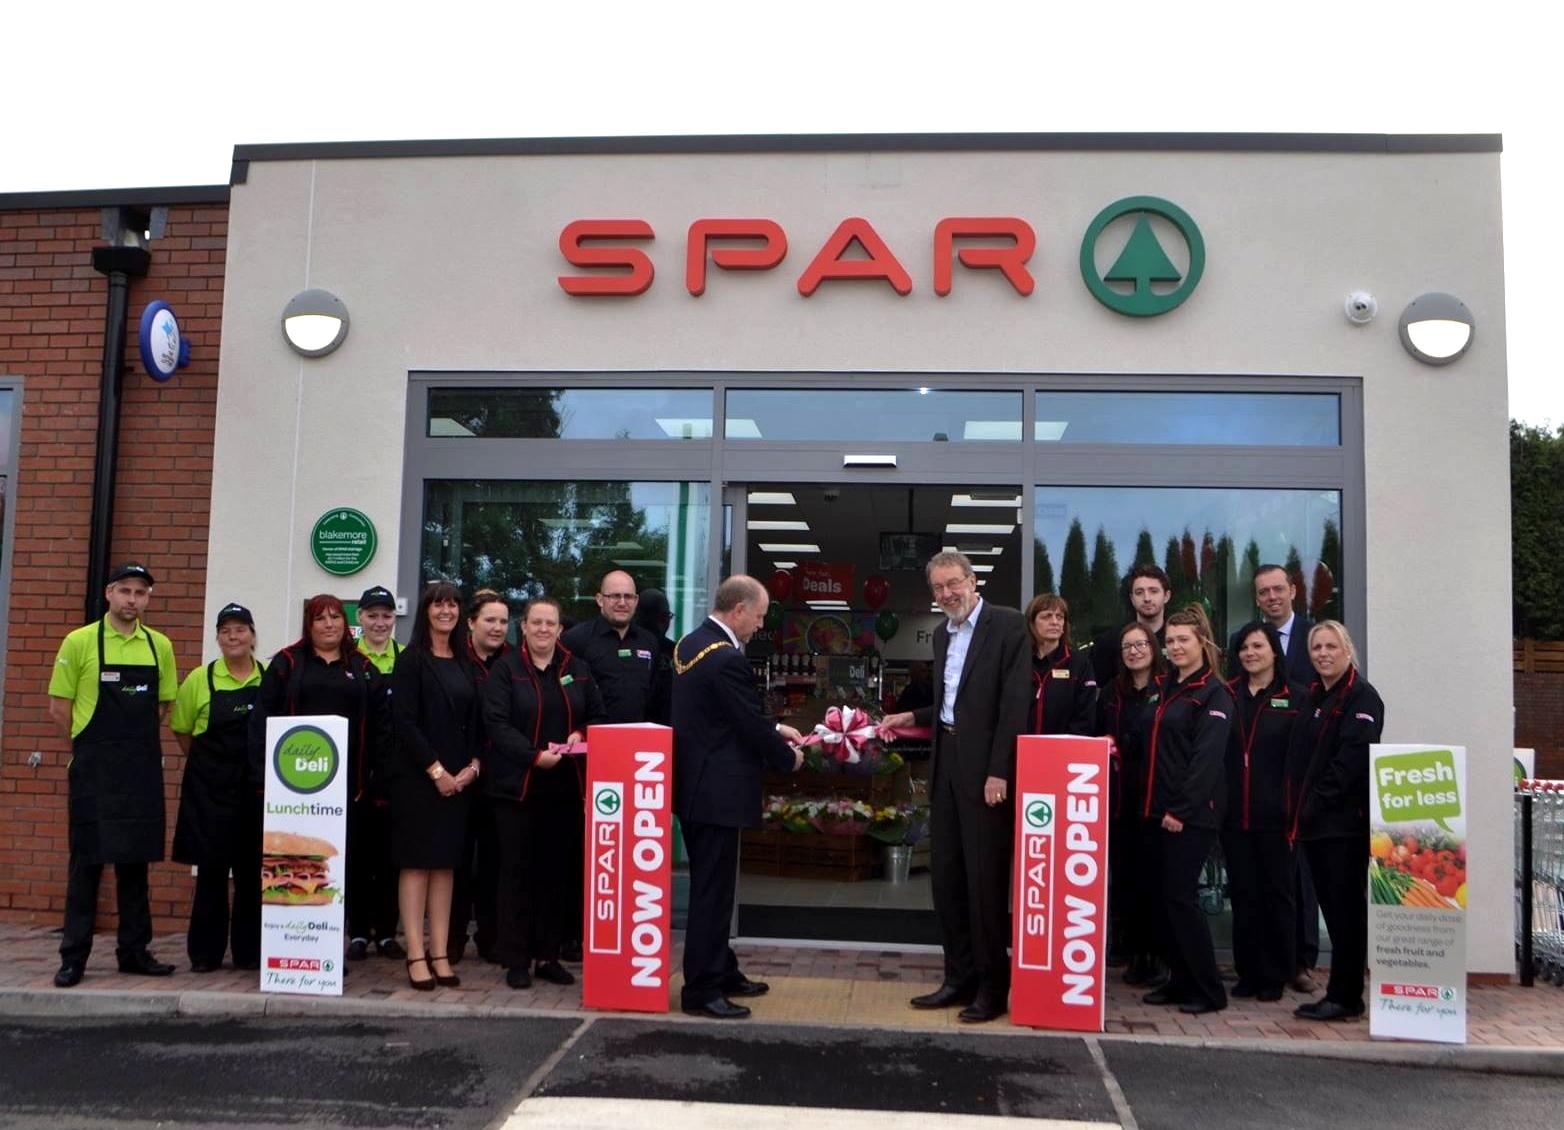 SPAR_Aldridge_launch